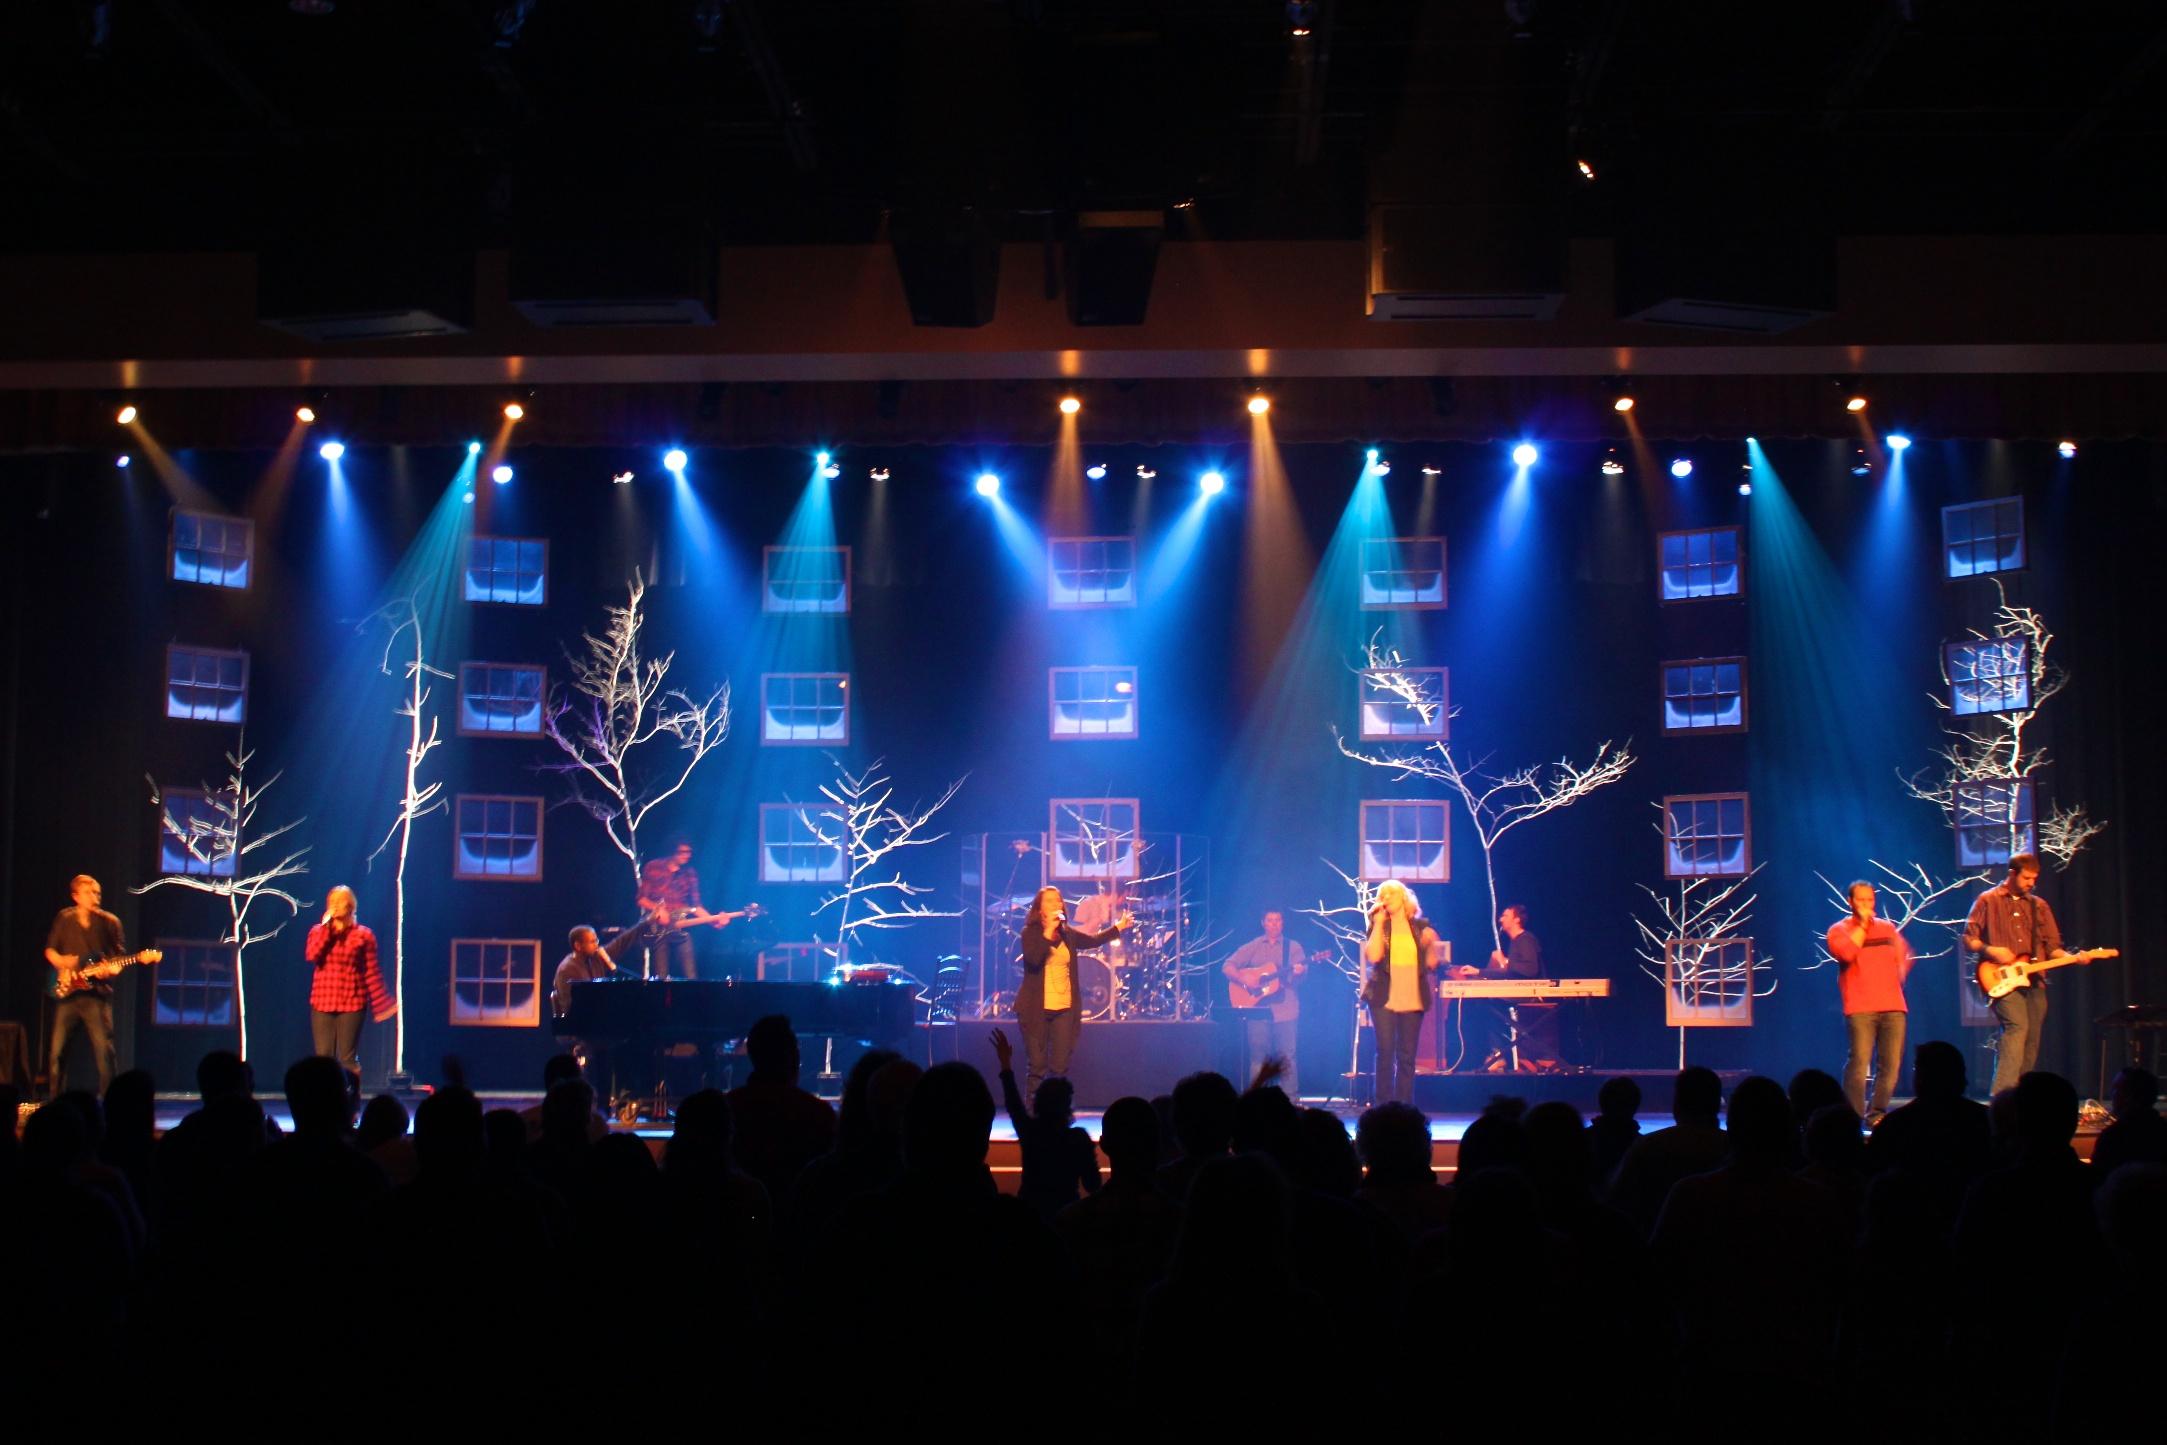 Throwback Frosty Windows Church Stage Design Ideas